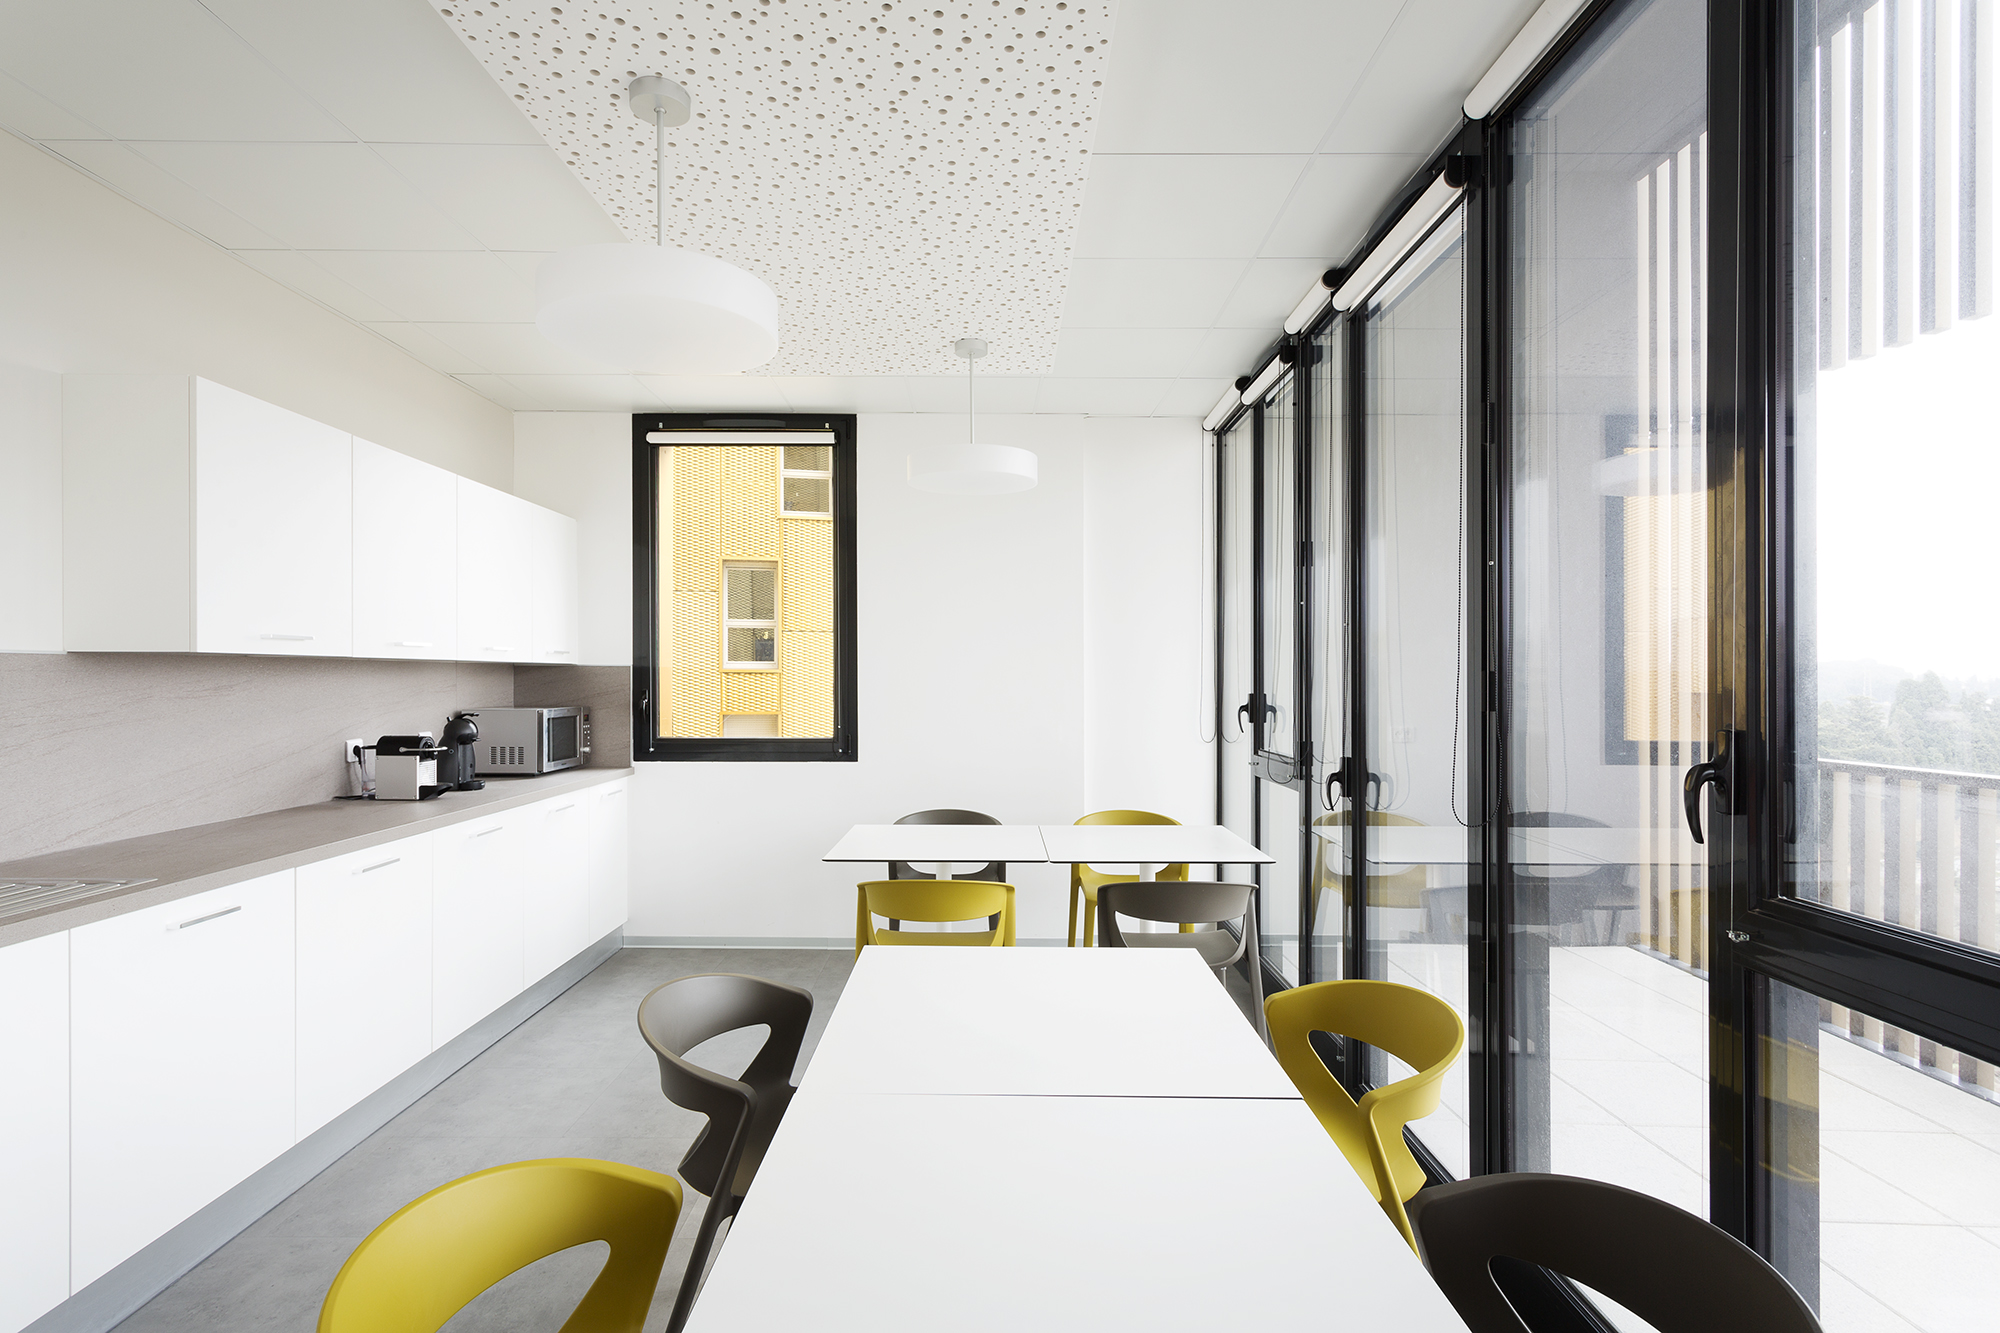 Imagine-architecture-archi-studio-dora-mar-bureaux-offices-architectural-teamarchi-marie-caroline-lucat-2017